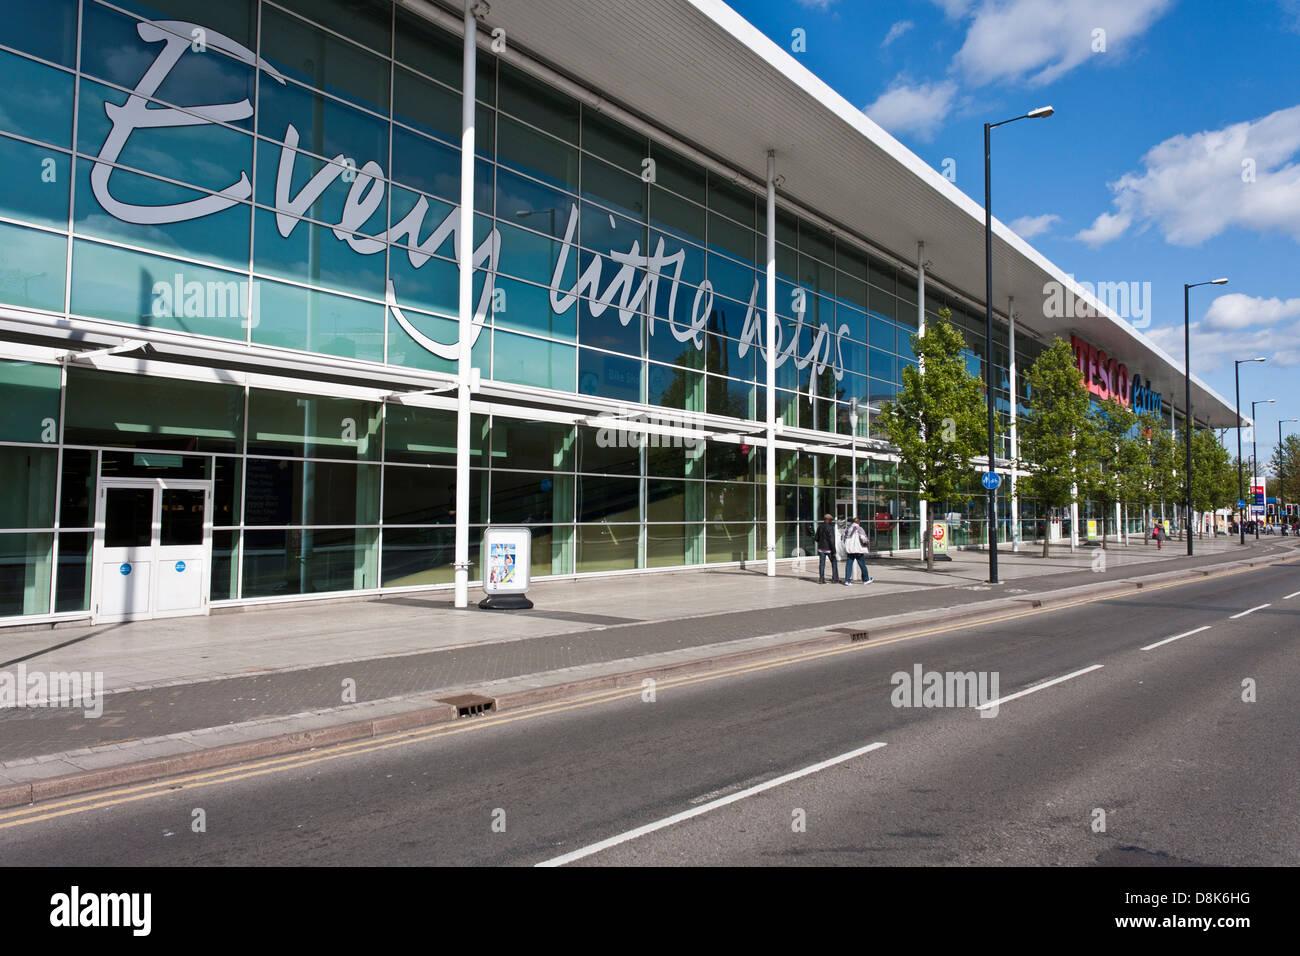 exterior-of-tesco-extra-supermarket-in-s